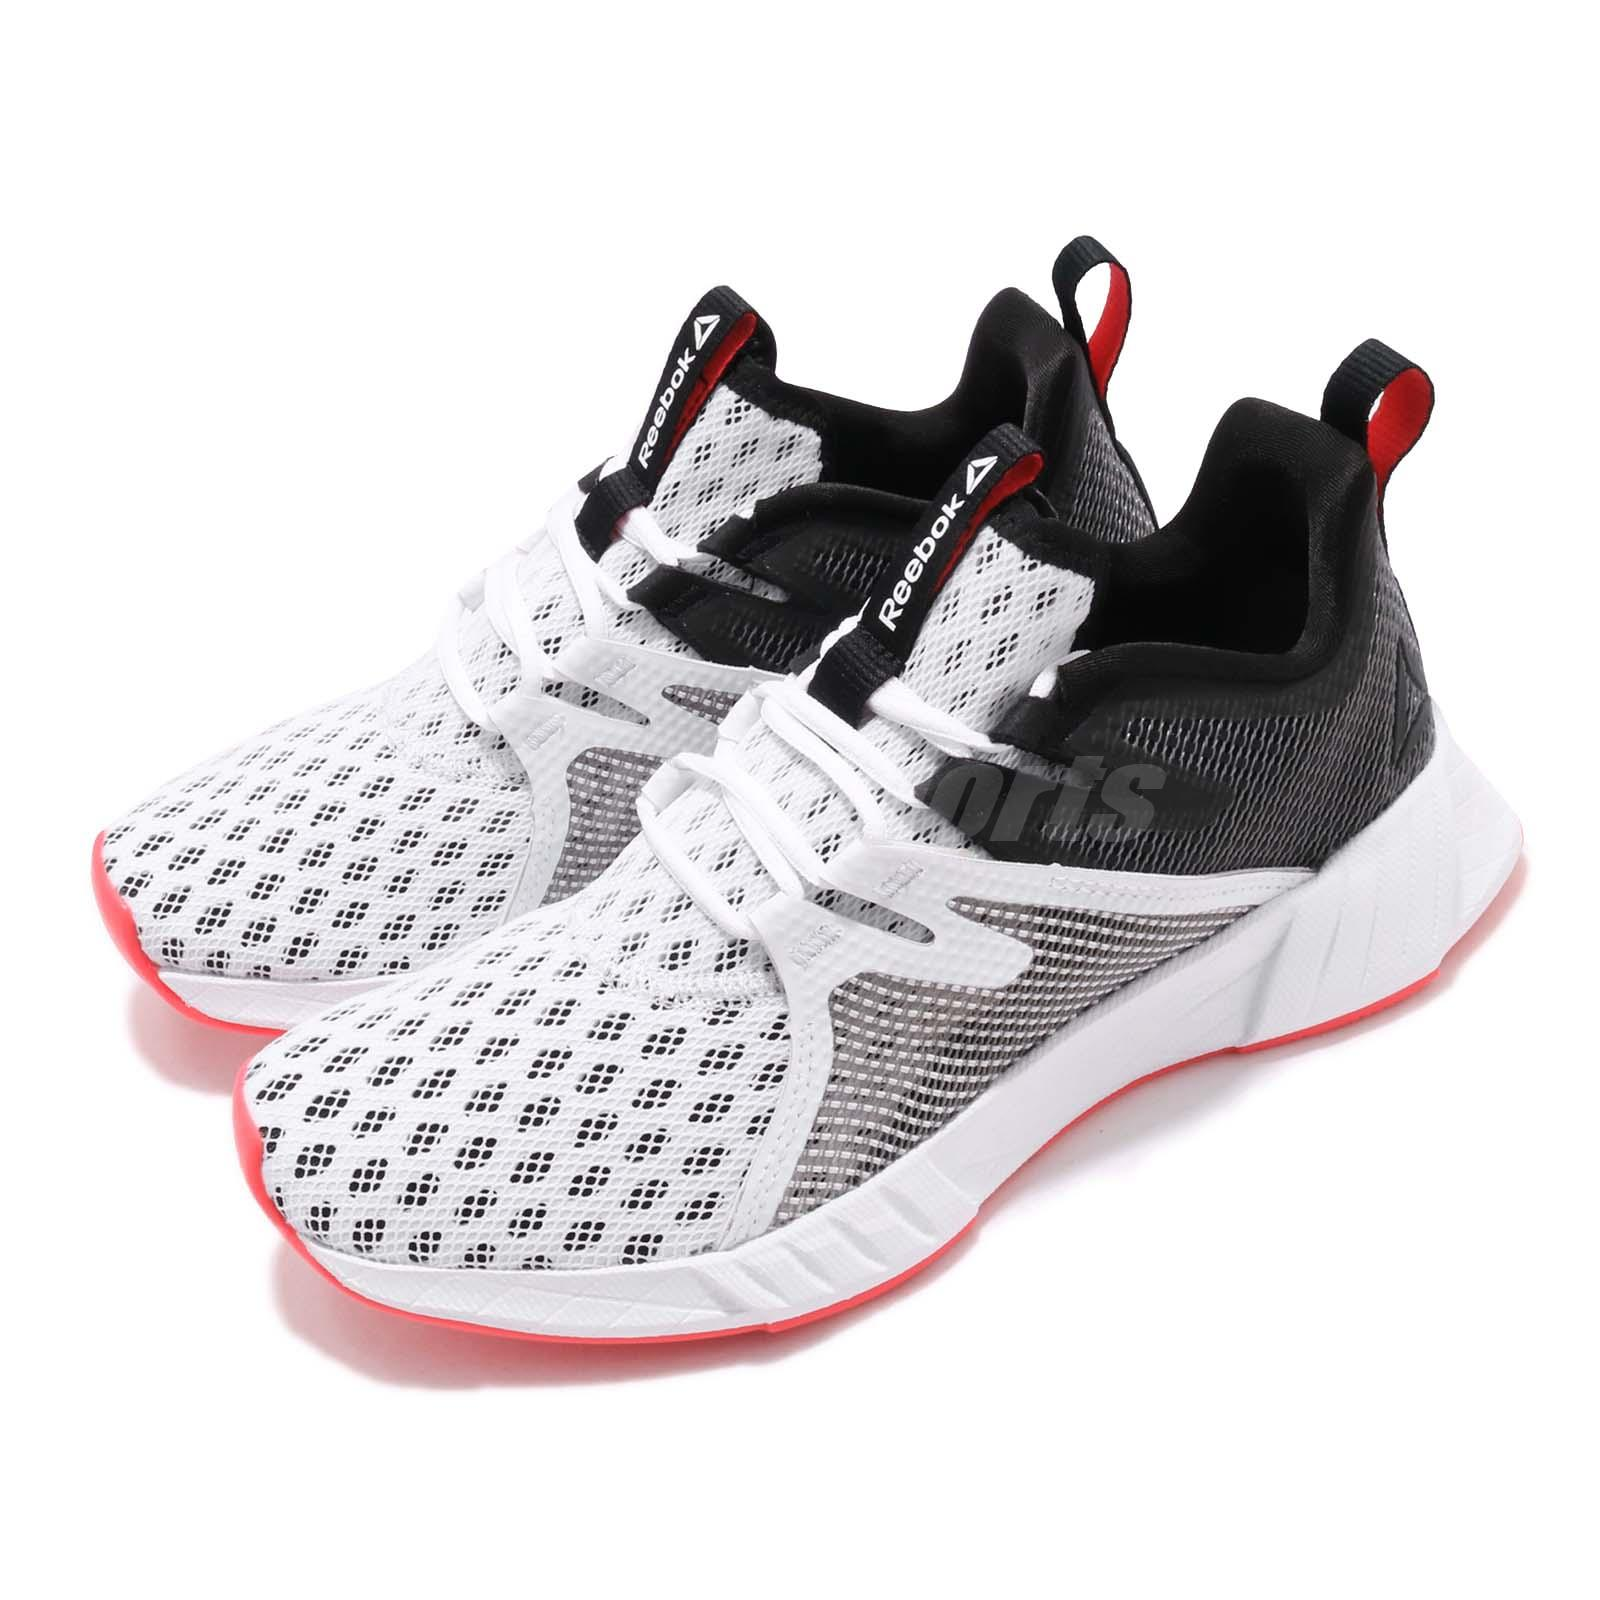 Acusación Deformación hazlo plano  Reebok Fusium Run 2.0 White Black Red Silver Women Running Shoes ...